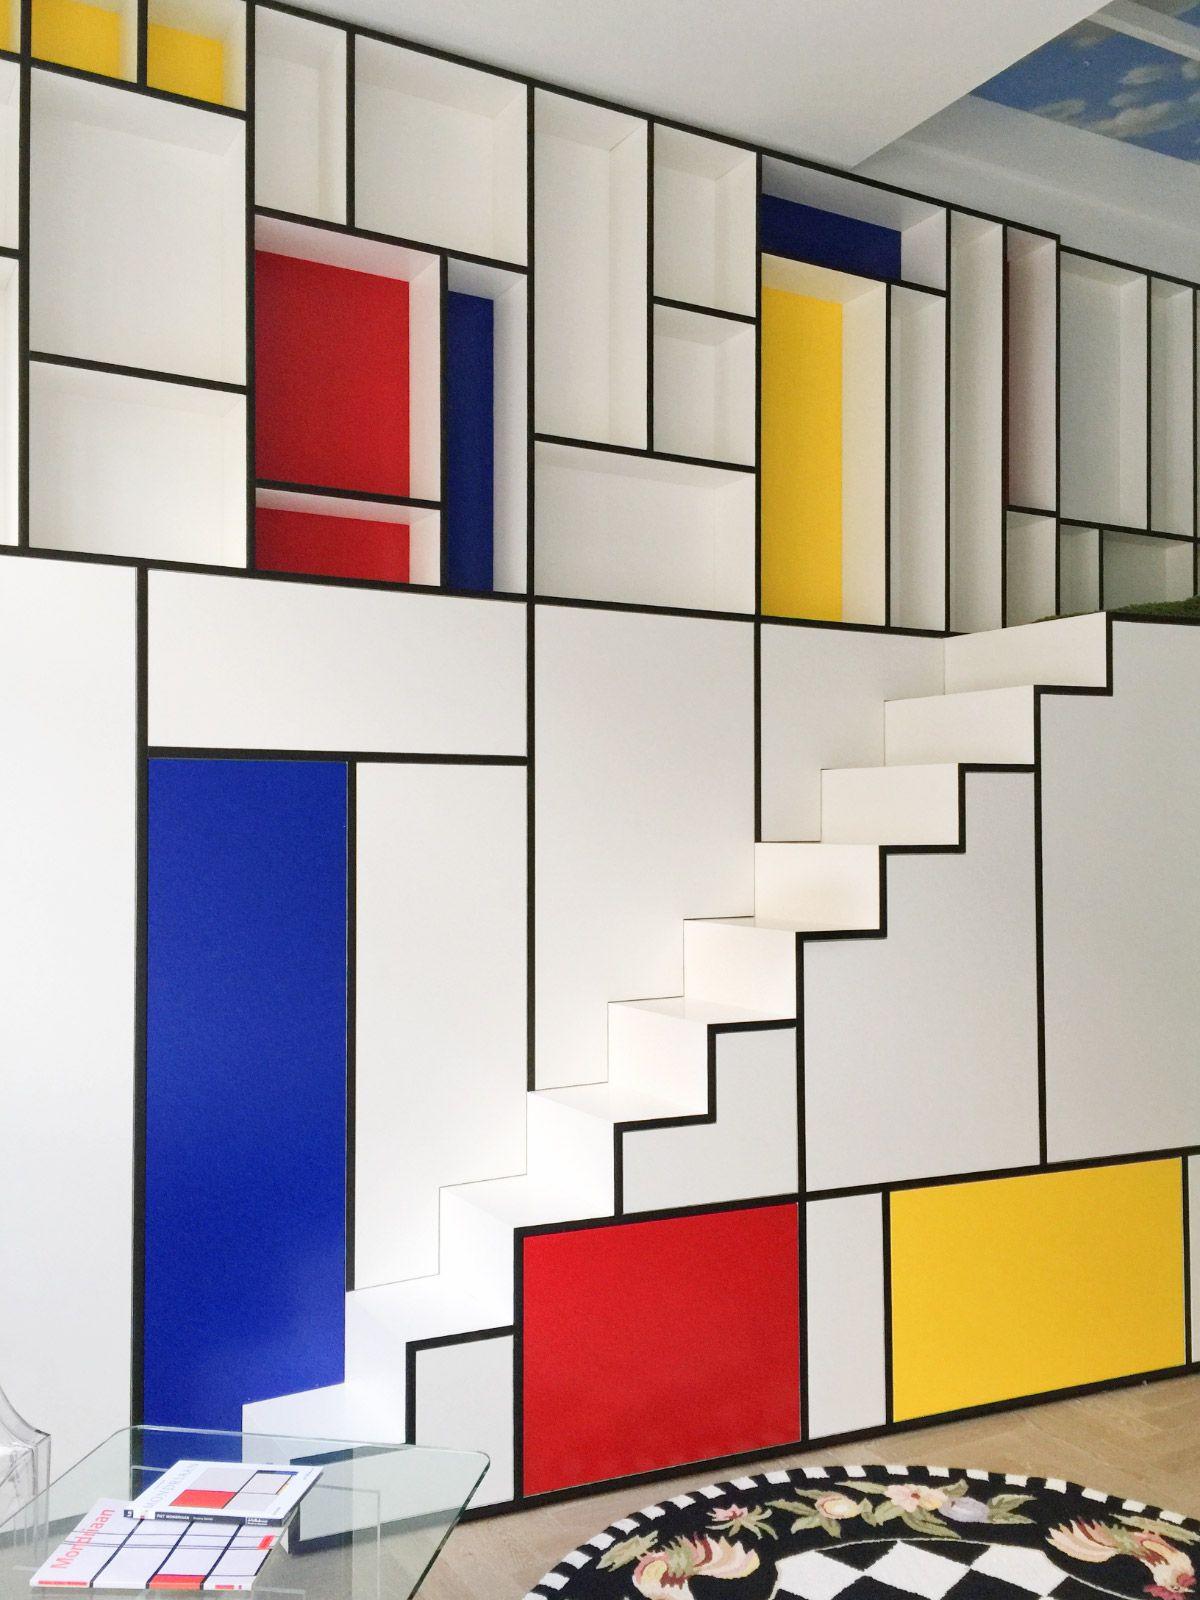 Piet Mondrian Inspired Interior Design To Give Your Home The De Stijl Flair Staircase Design Bauhaus Interior Mondrian